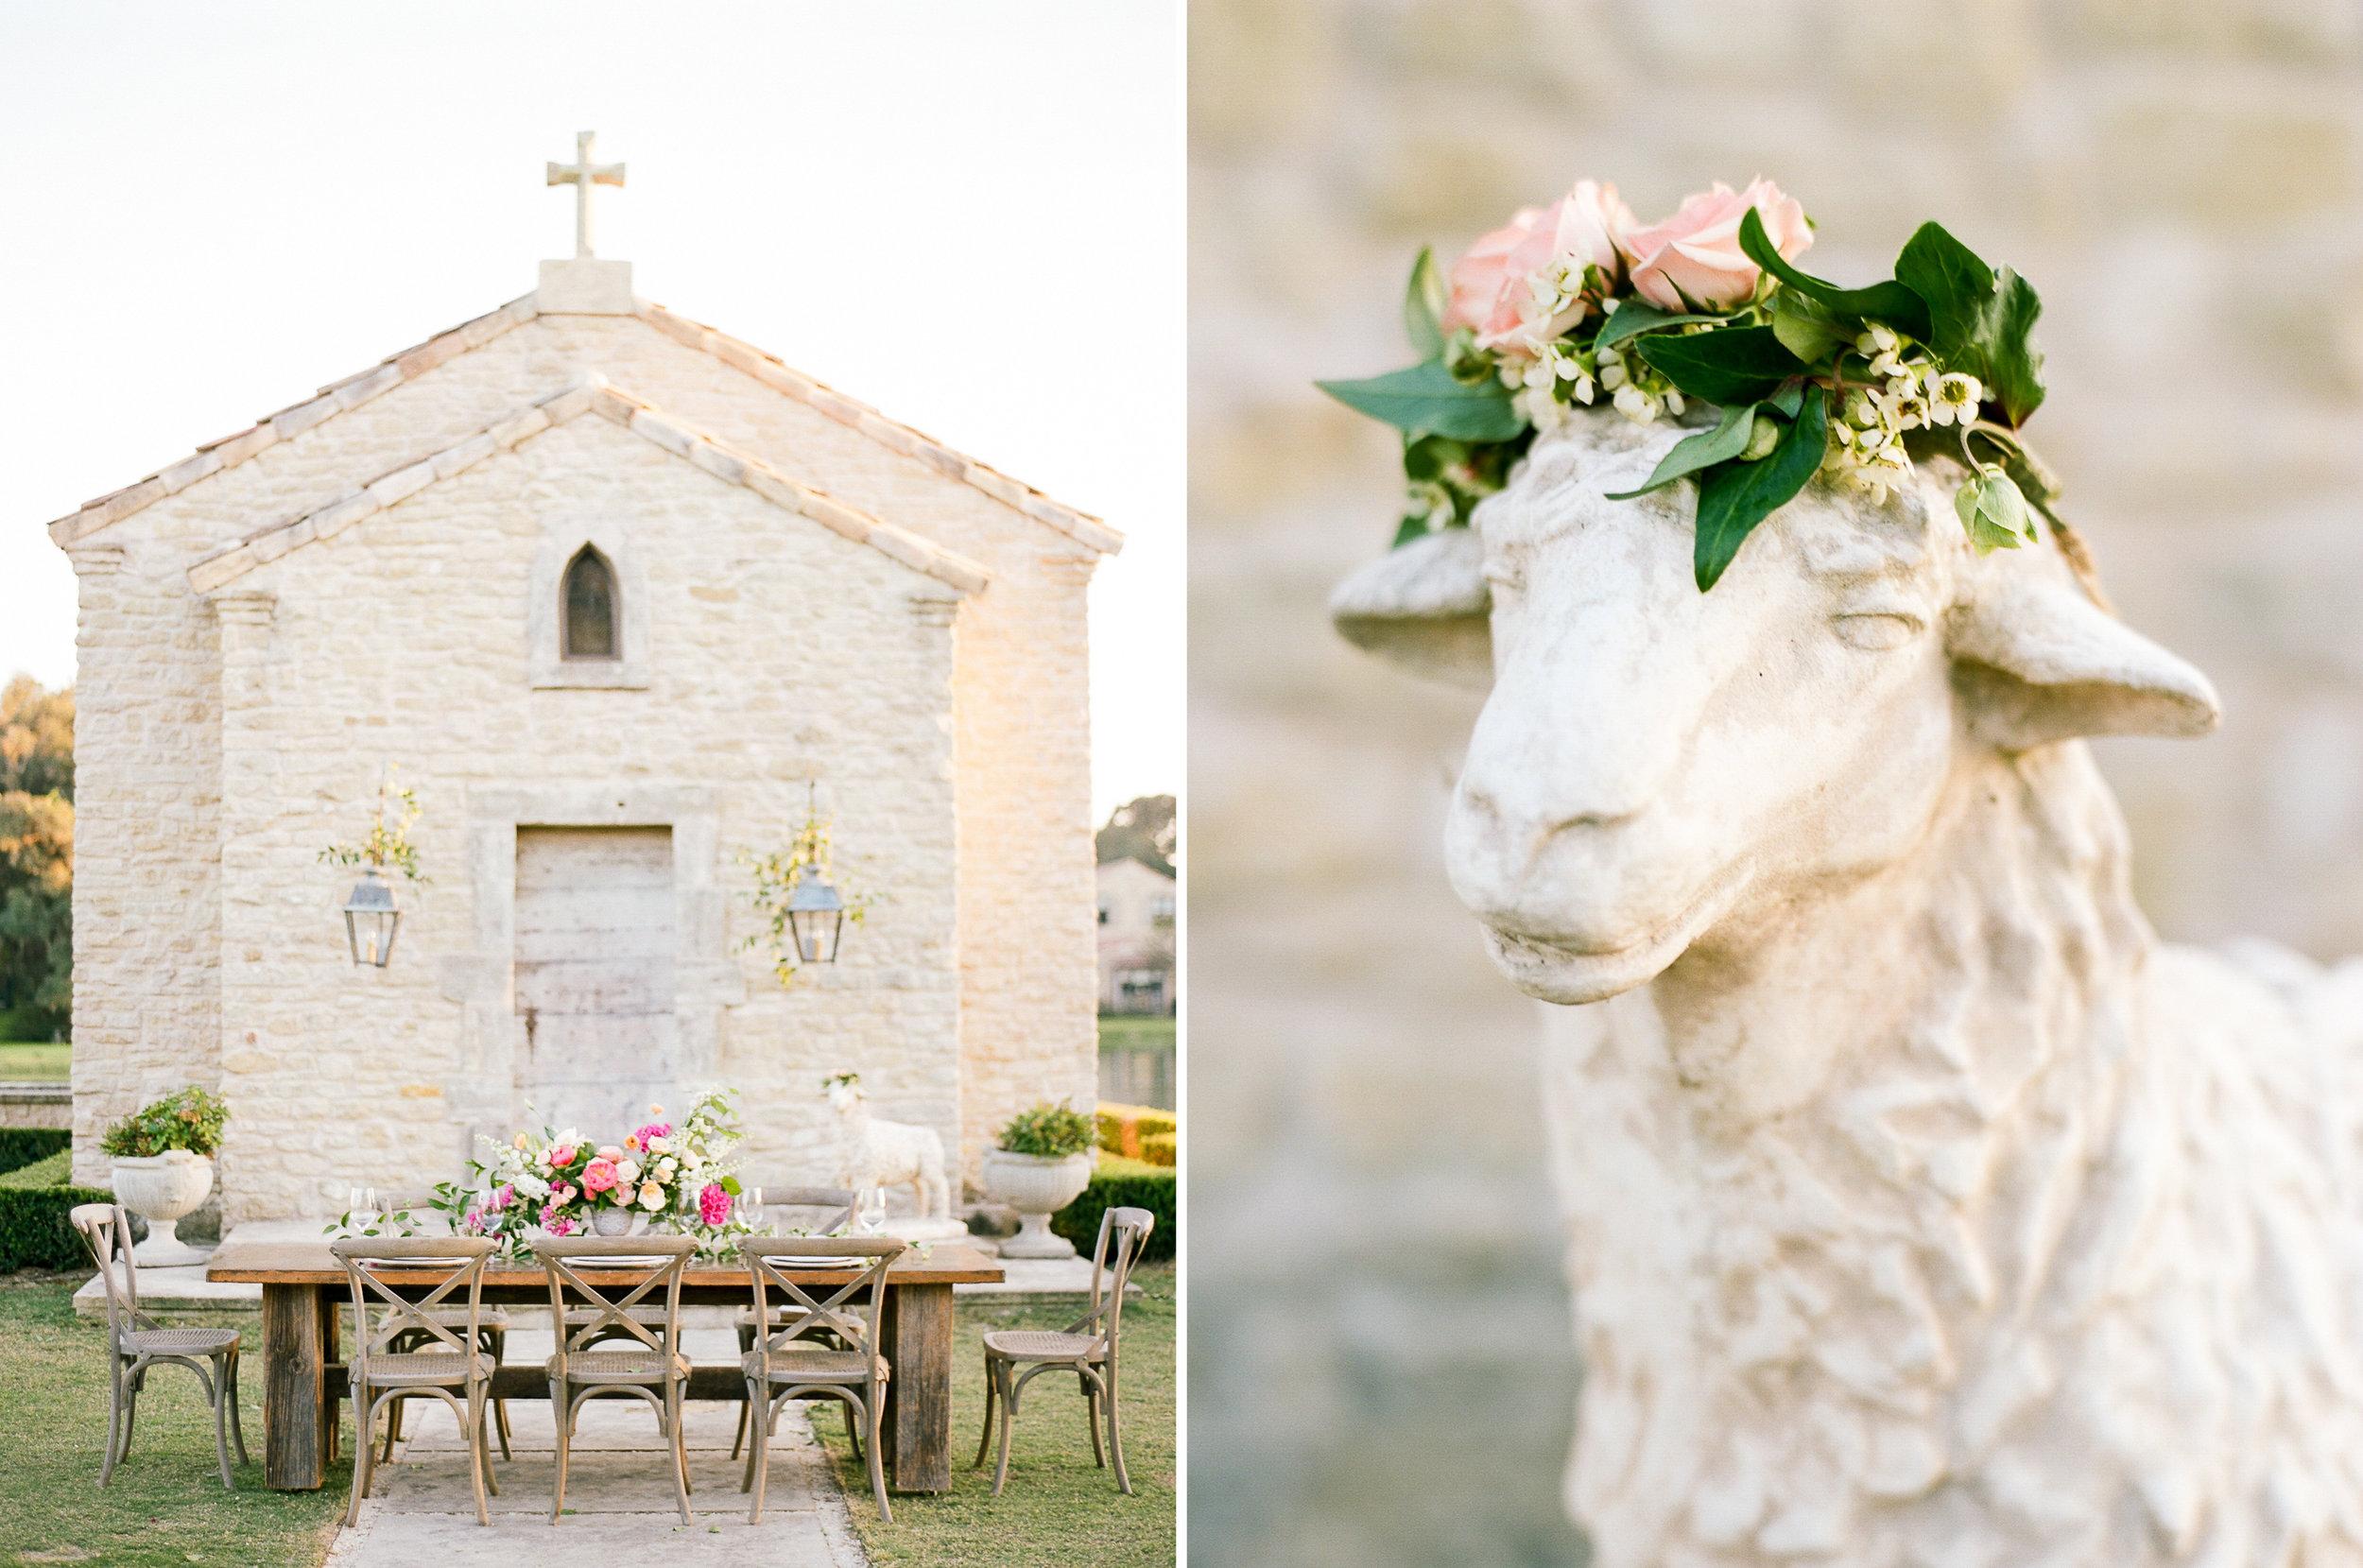 Top-Houston-Wedding-Photographer-Dana-Fernandez-Photography-The-Clubs-At-Houston-Oaks-Country-Club-Belle-Events-Film-Fine-Art-Destination-110.jpg